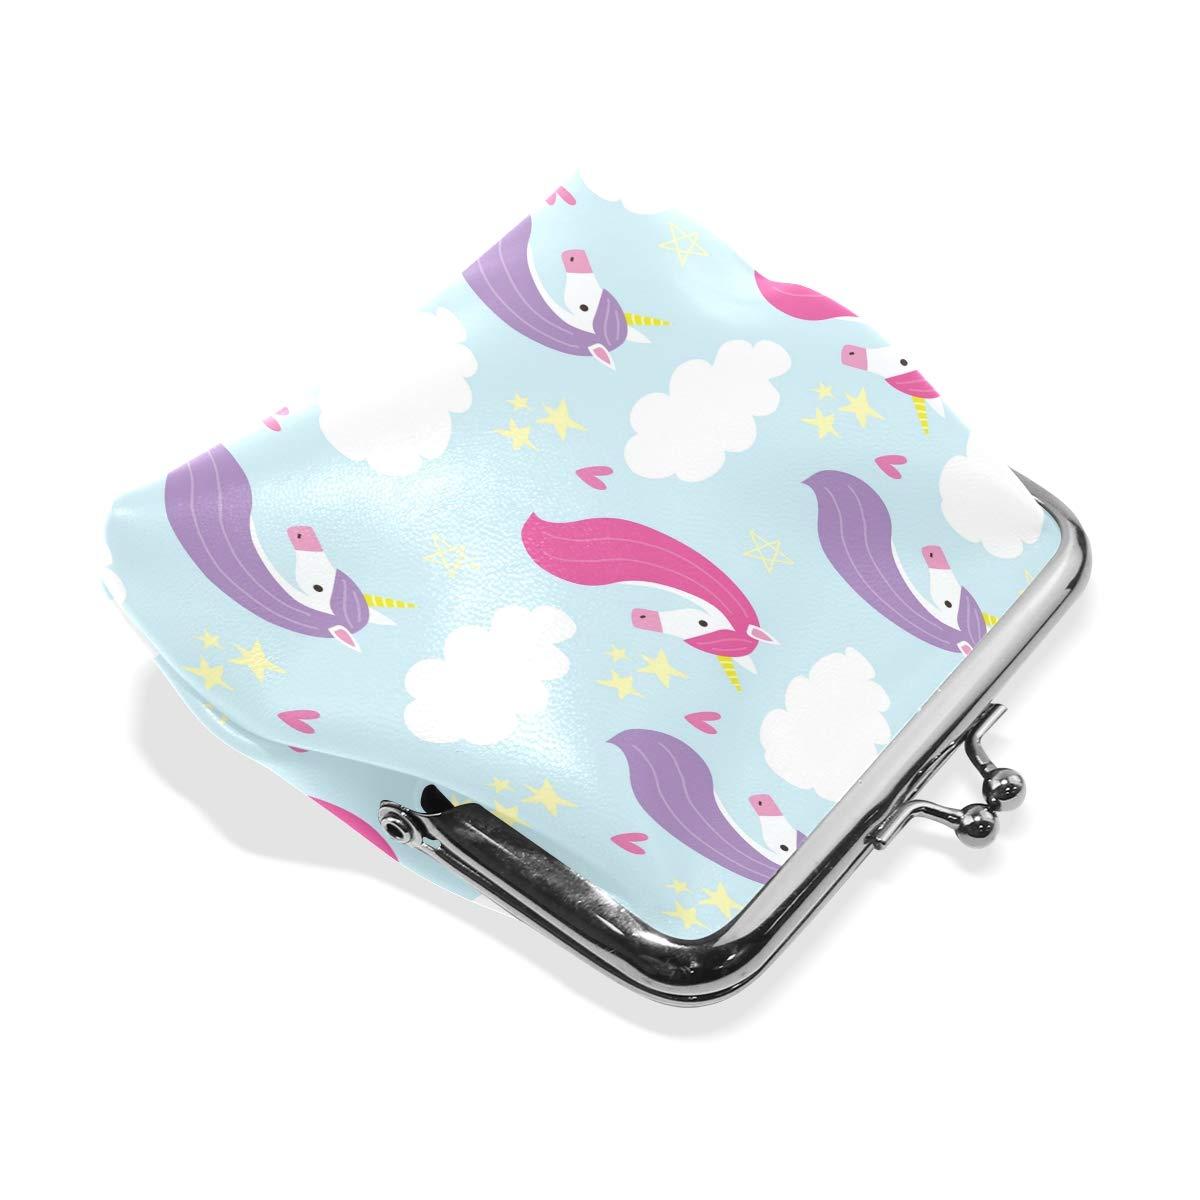 LALATOP Unicorn Pattern Womens Coin Pouch Purse wallet Card Holder Clutch Handbag